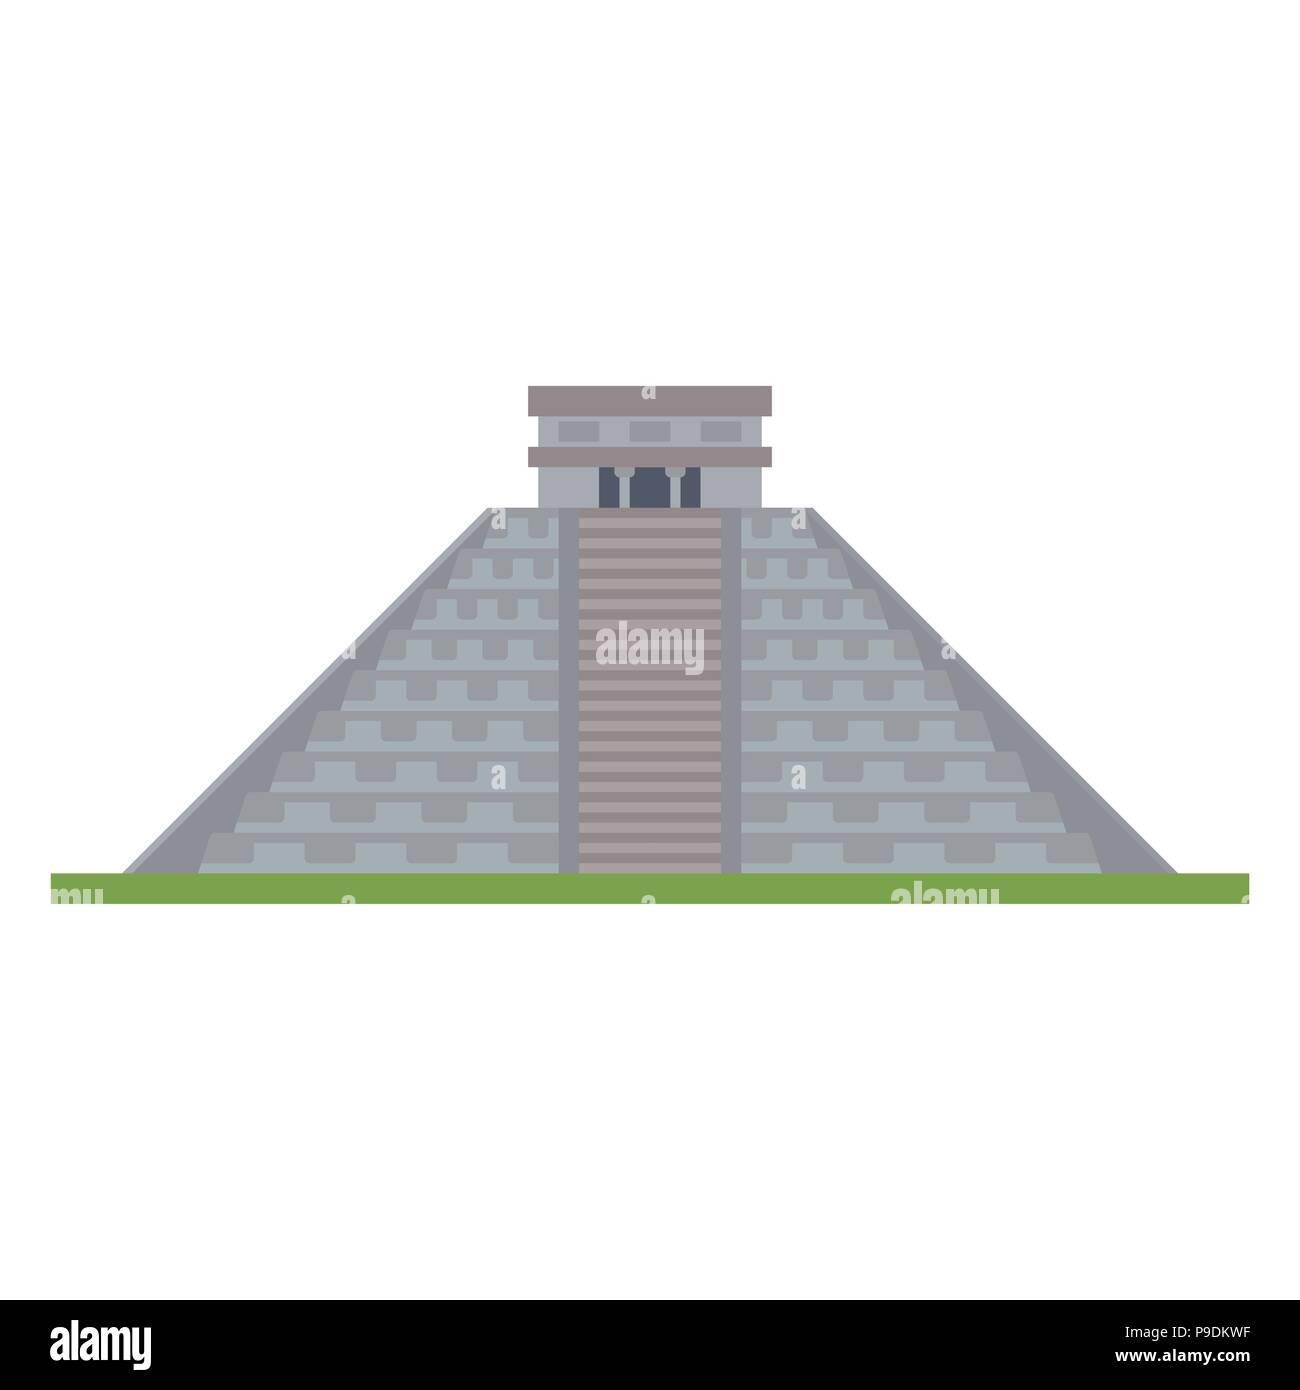 Flat design isolated vector icon of kukulkan pyramid at Chichen Itza, Yucatan, Mexico - Stock Image